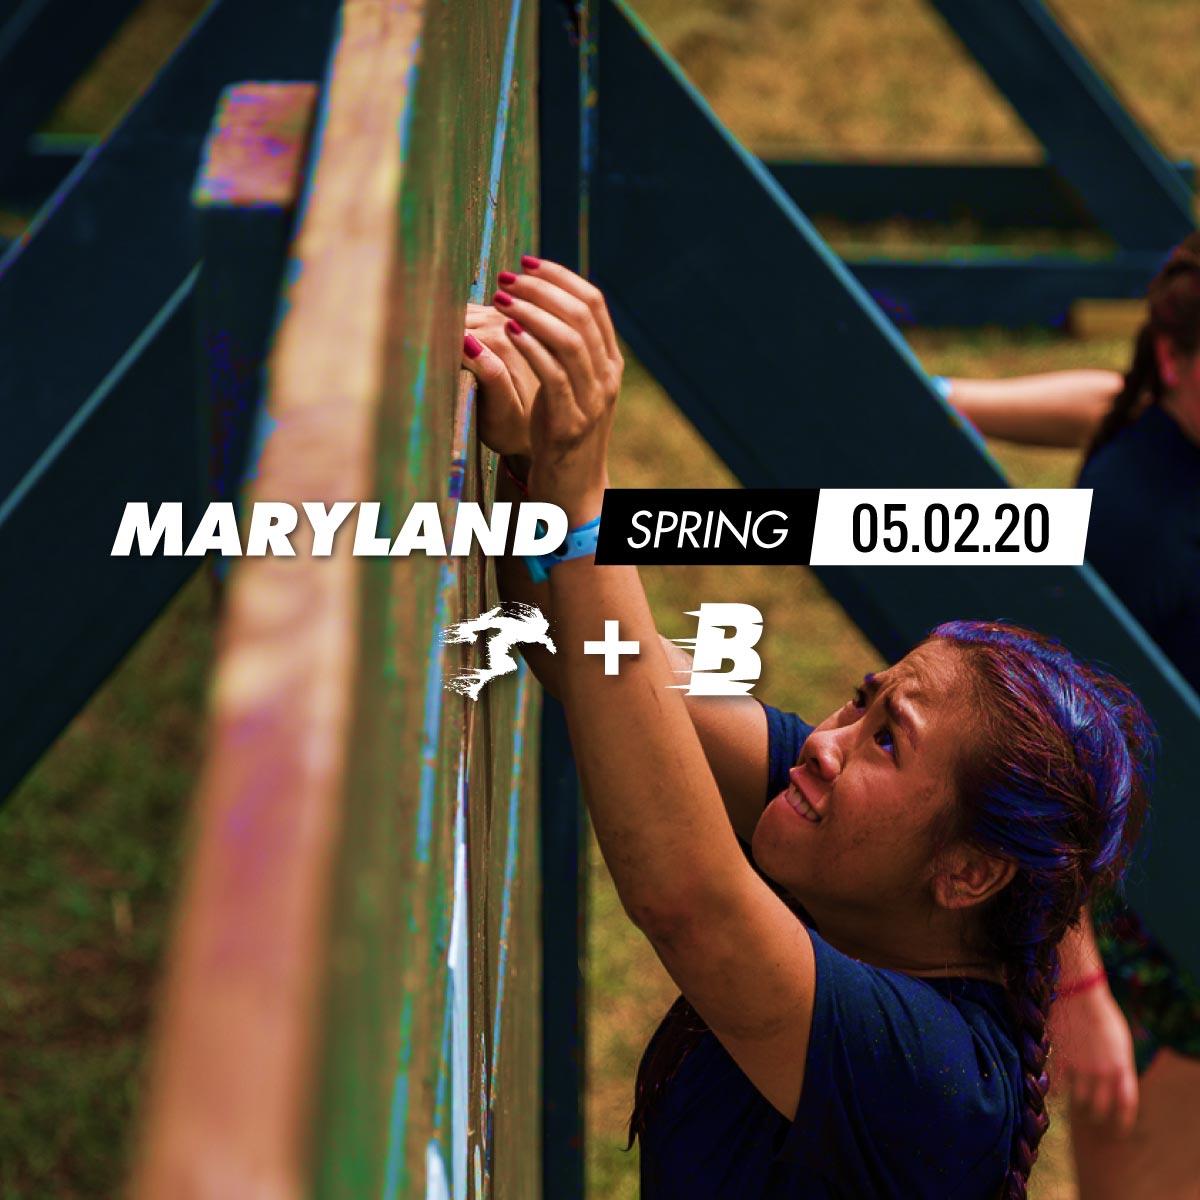 Maryland Spring 2020